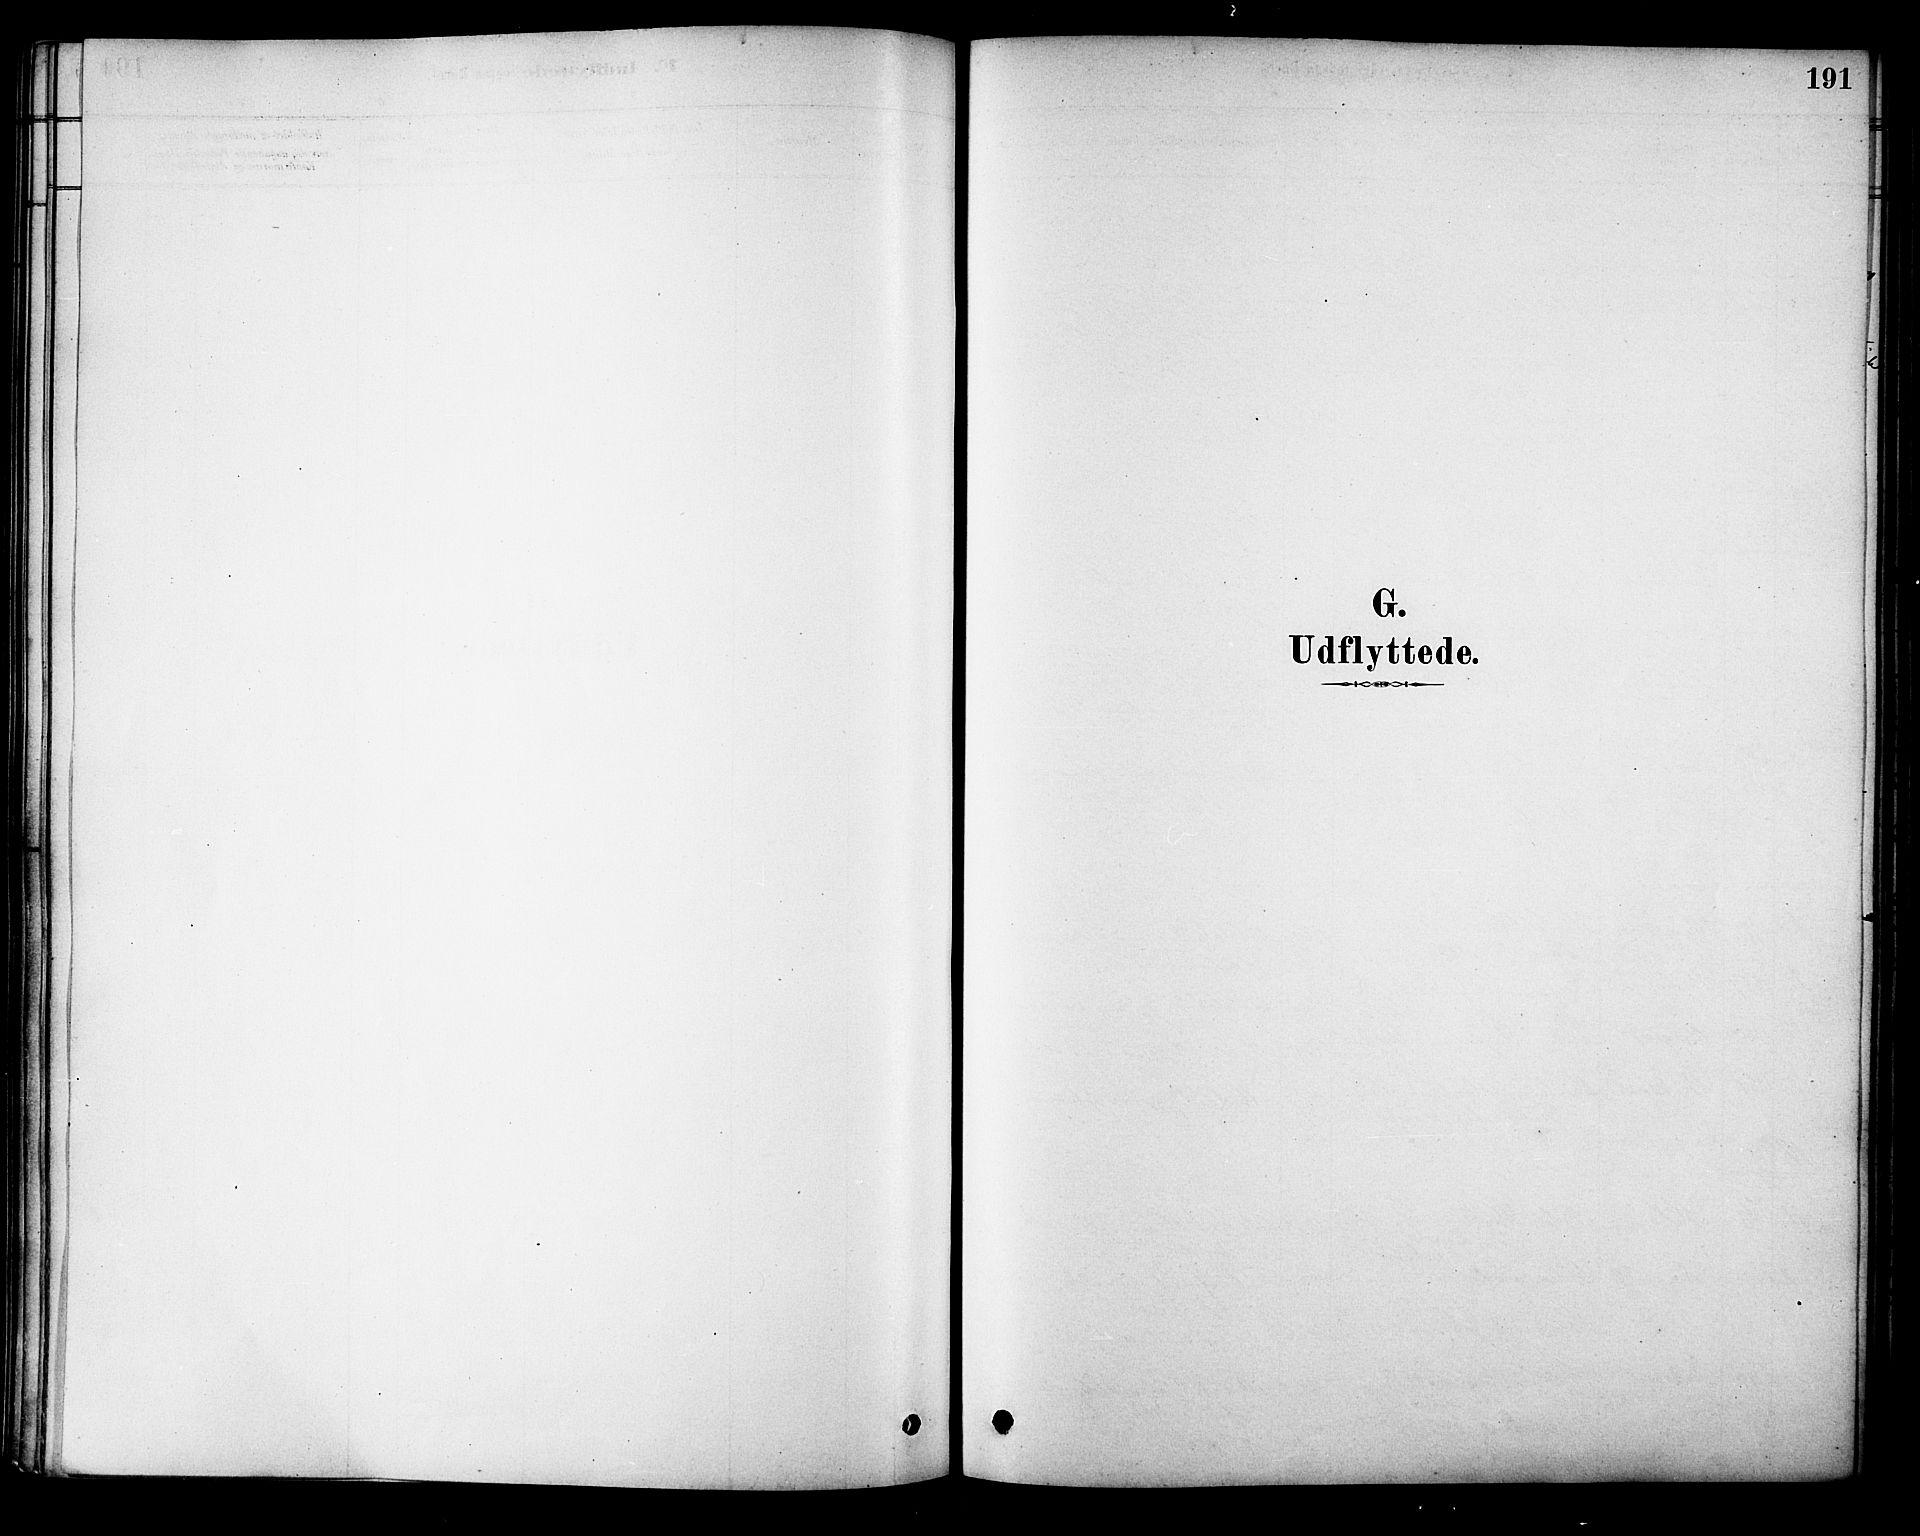 SAT, Ministerialprotokoller, klokkerbøker og fødselsregistre - Nordland, 885/L1204: Ministerialbok nr. 885A05, 1878-1892, s. 191